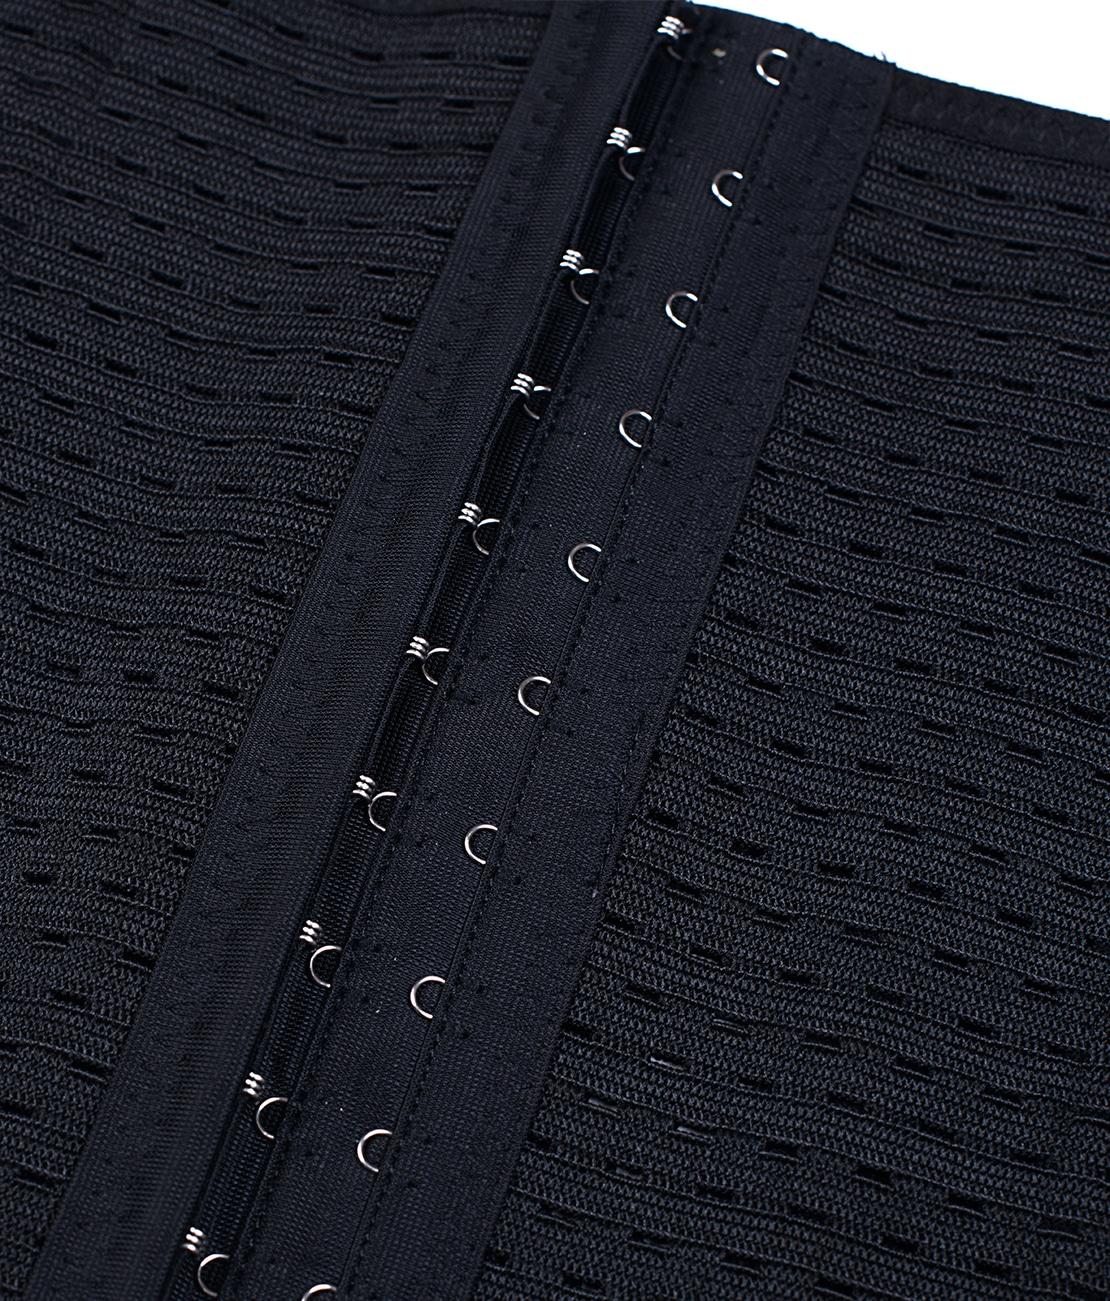 Gaine Taille Fine Noire Packshot Detail 2